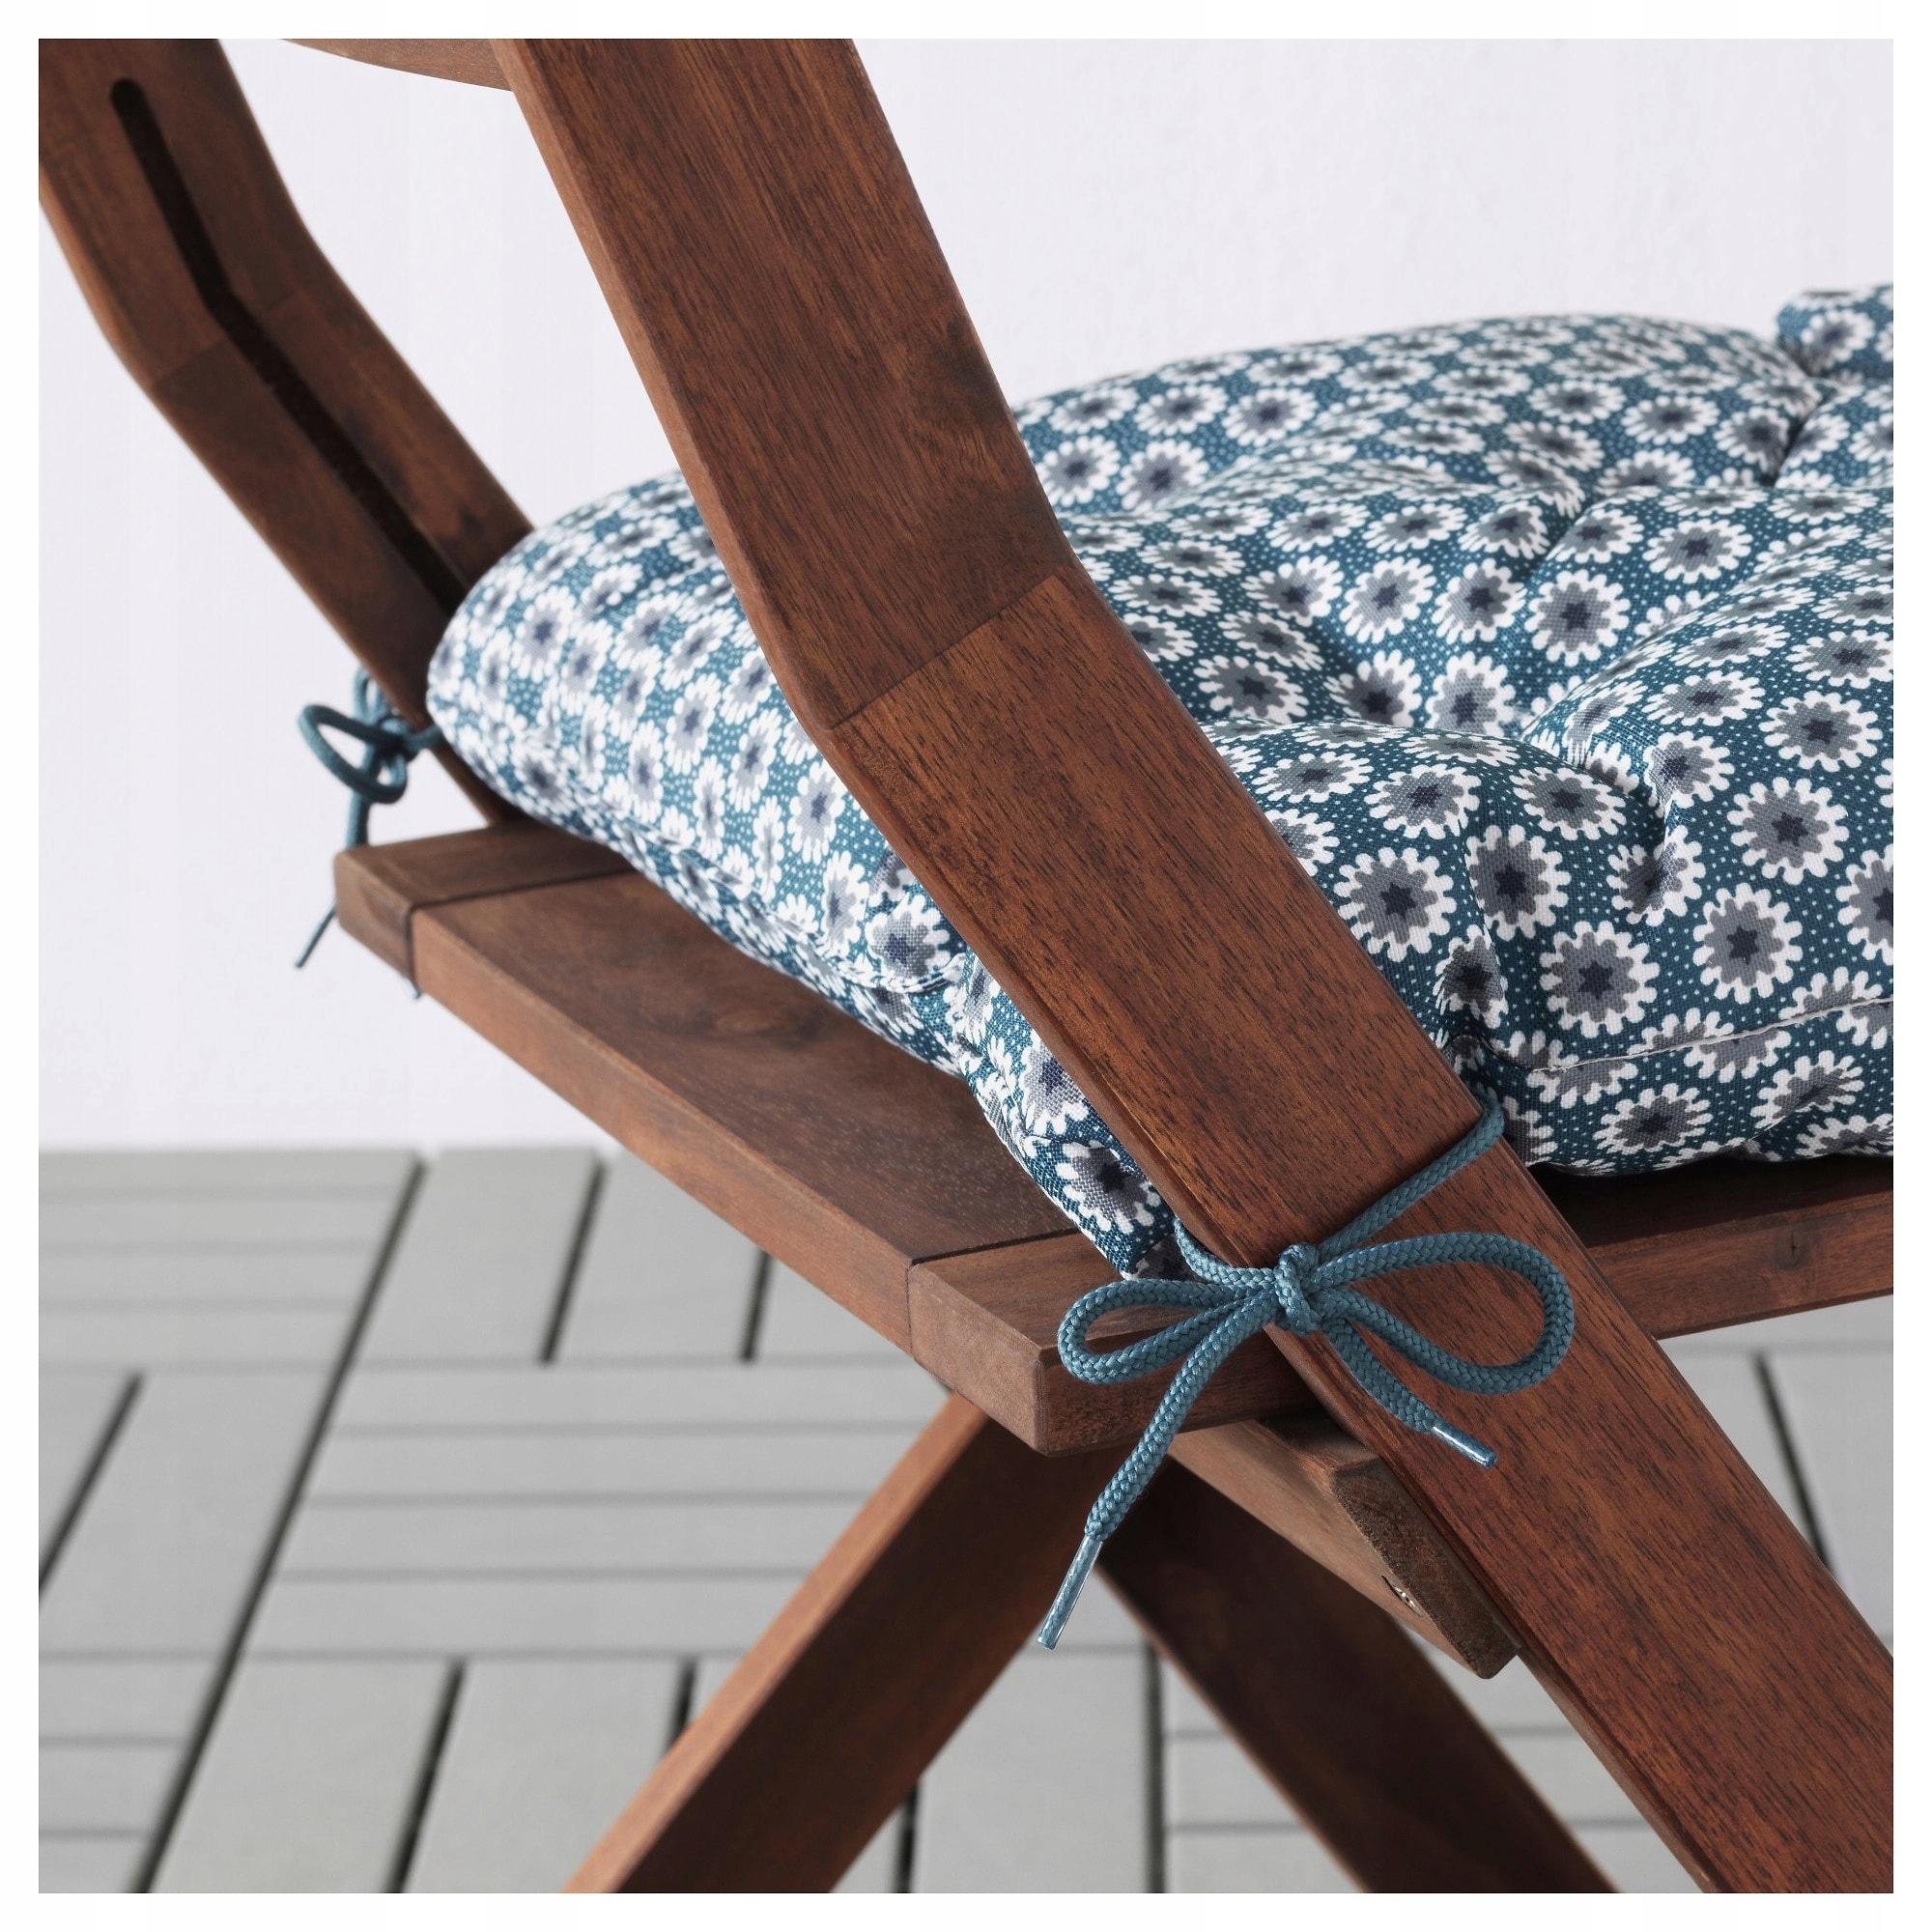 Ikea Ytteron Poduszka Na Krzesło Taboret 40x40 Cm 7530690943